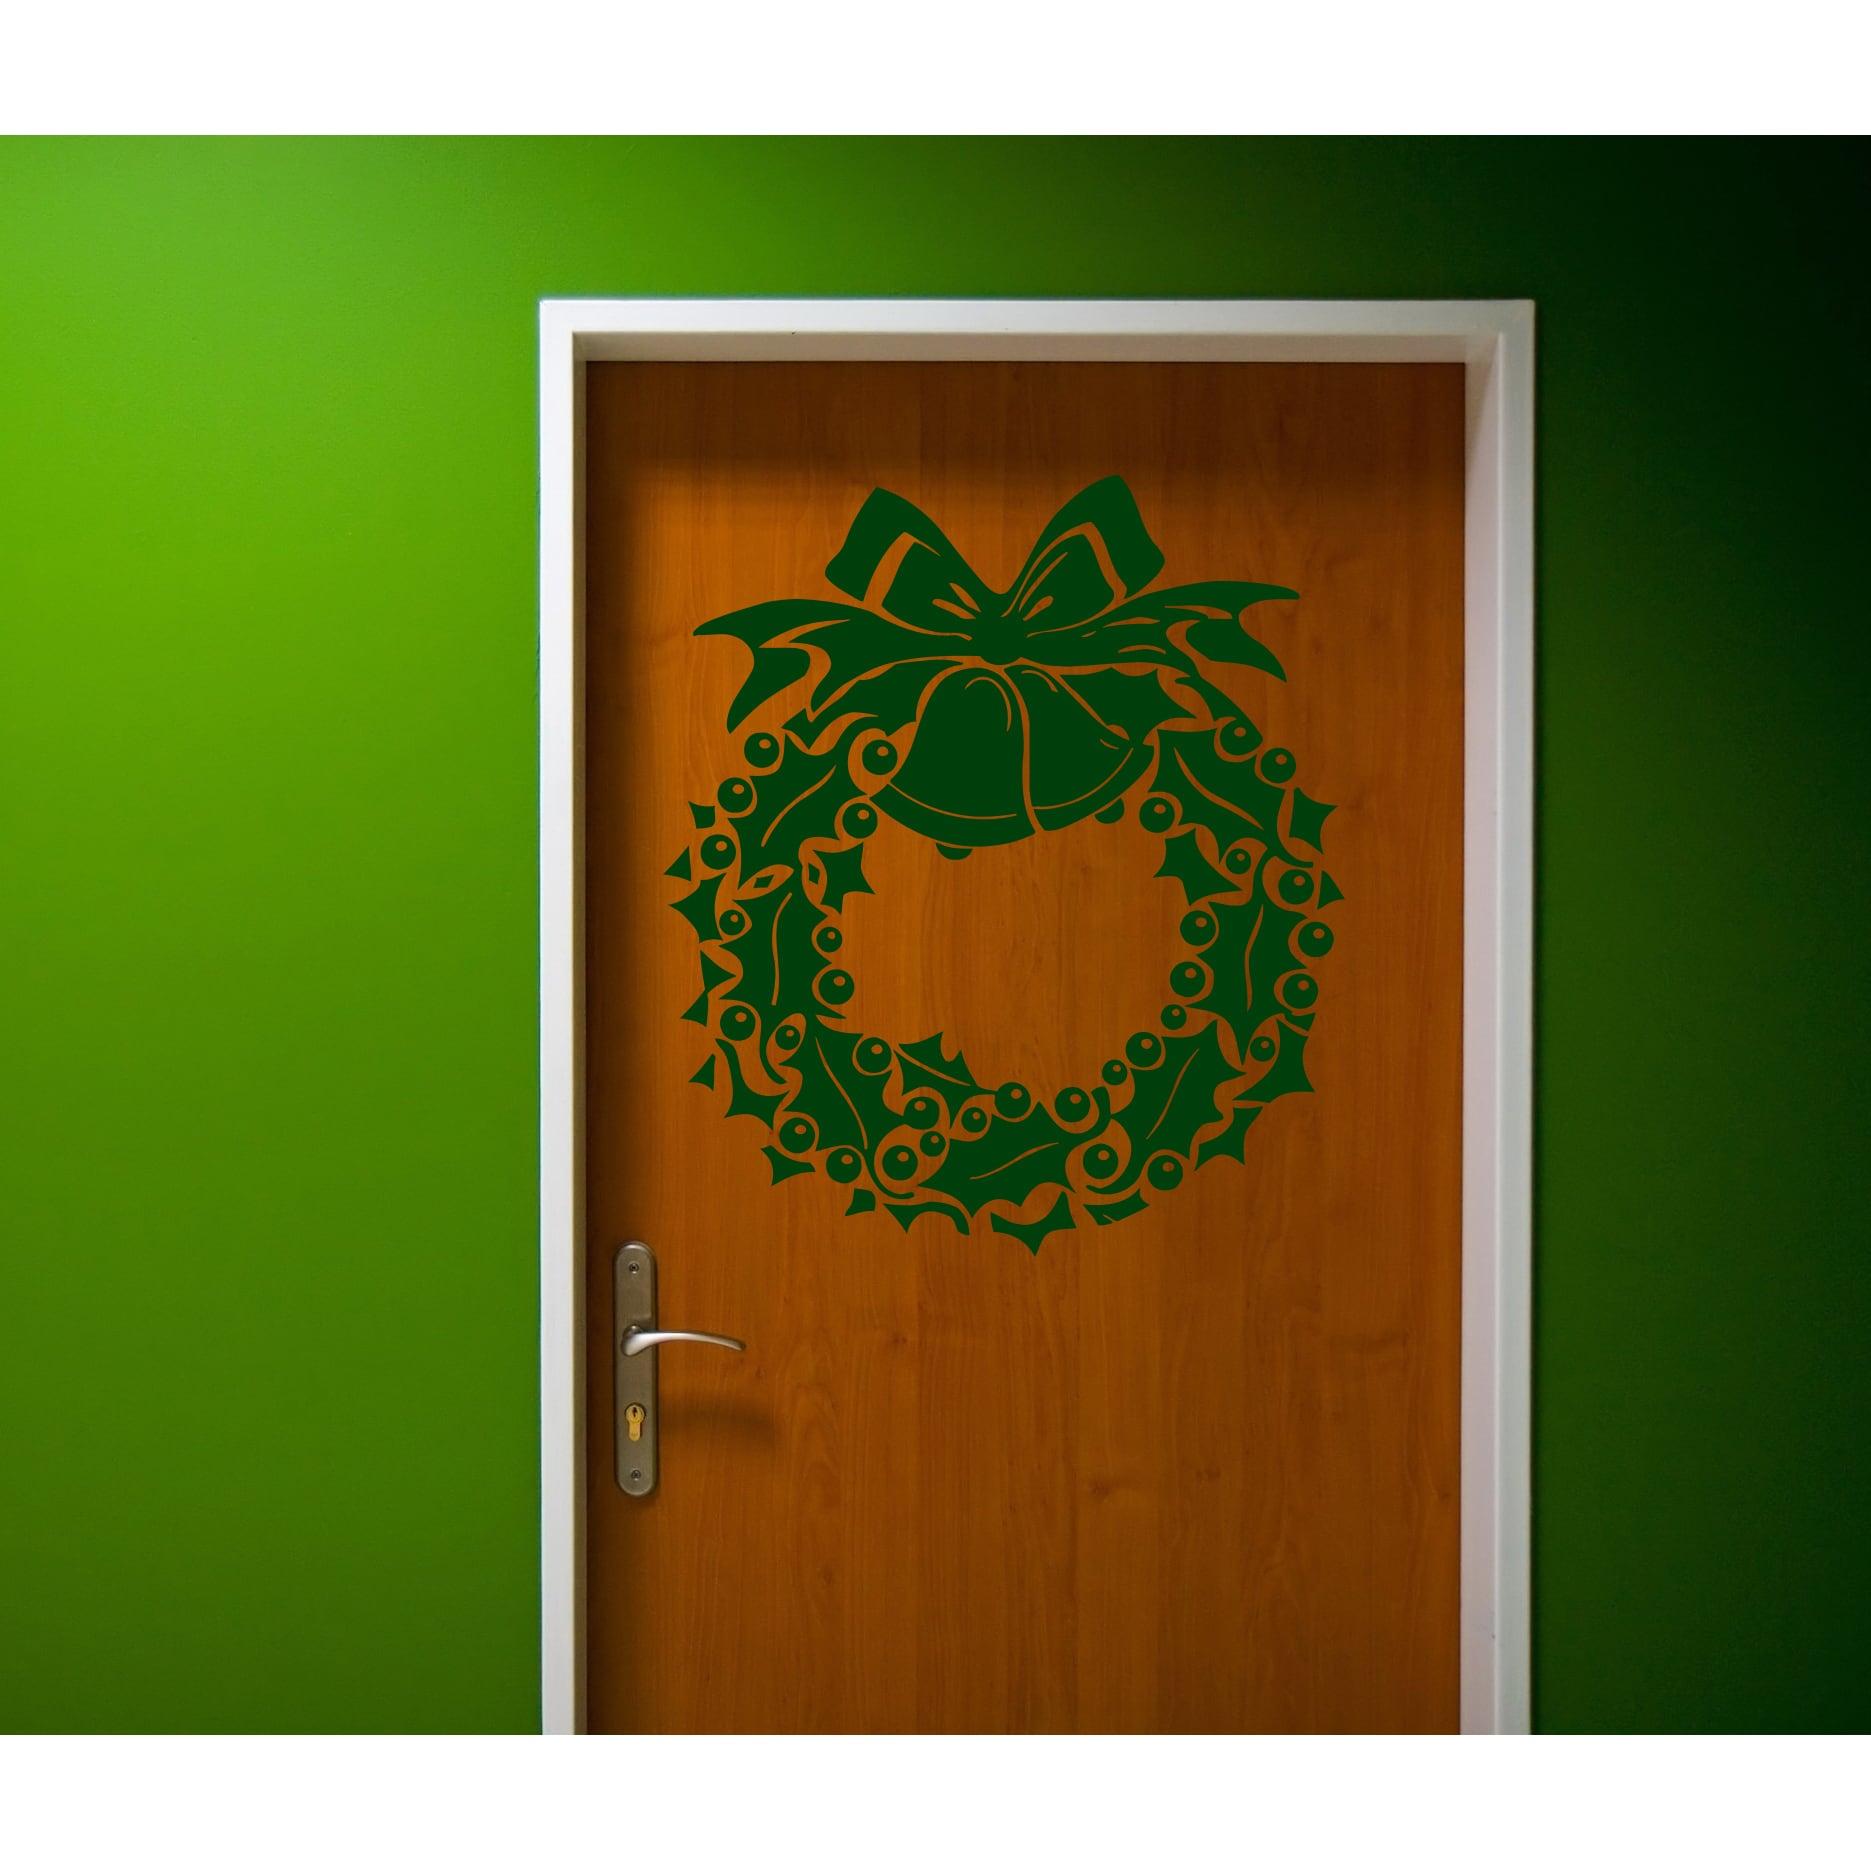 Wreath Merry Christmas Wall Art Sticker Decal Green (22 i...